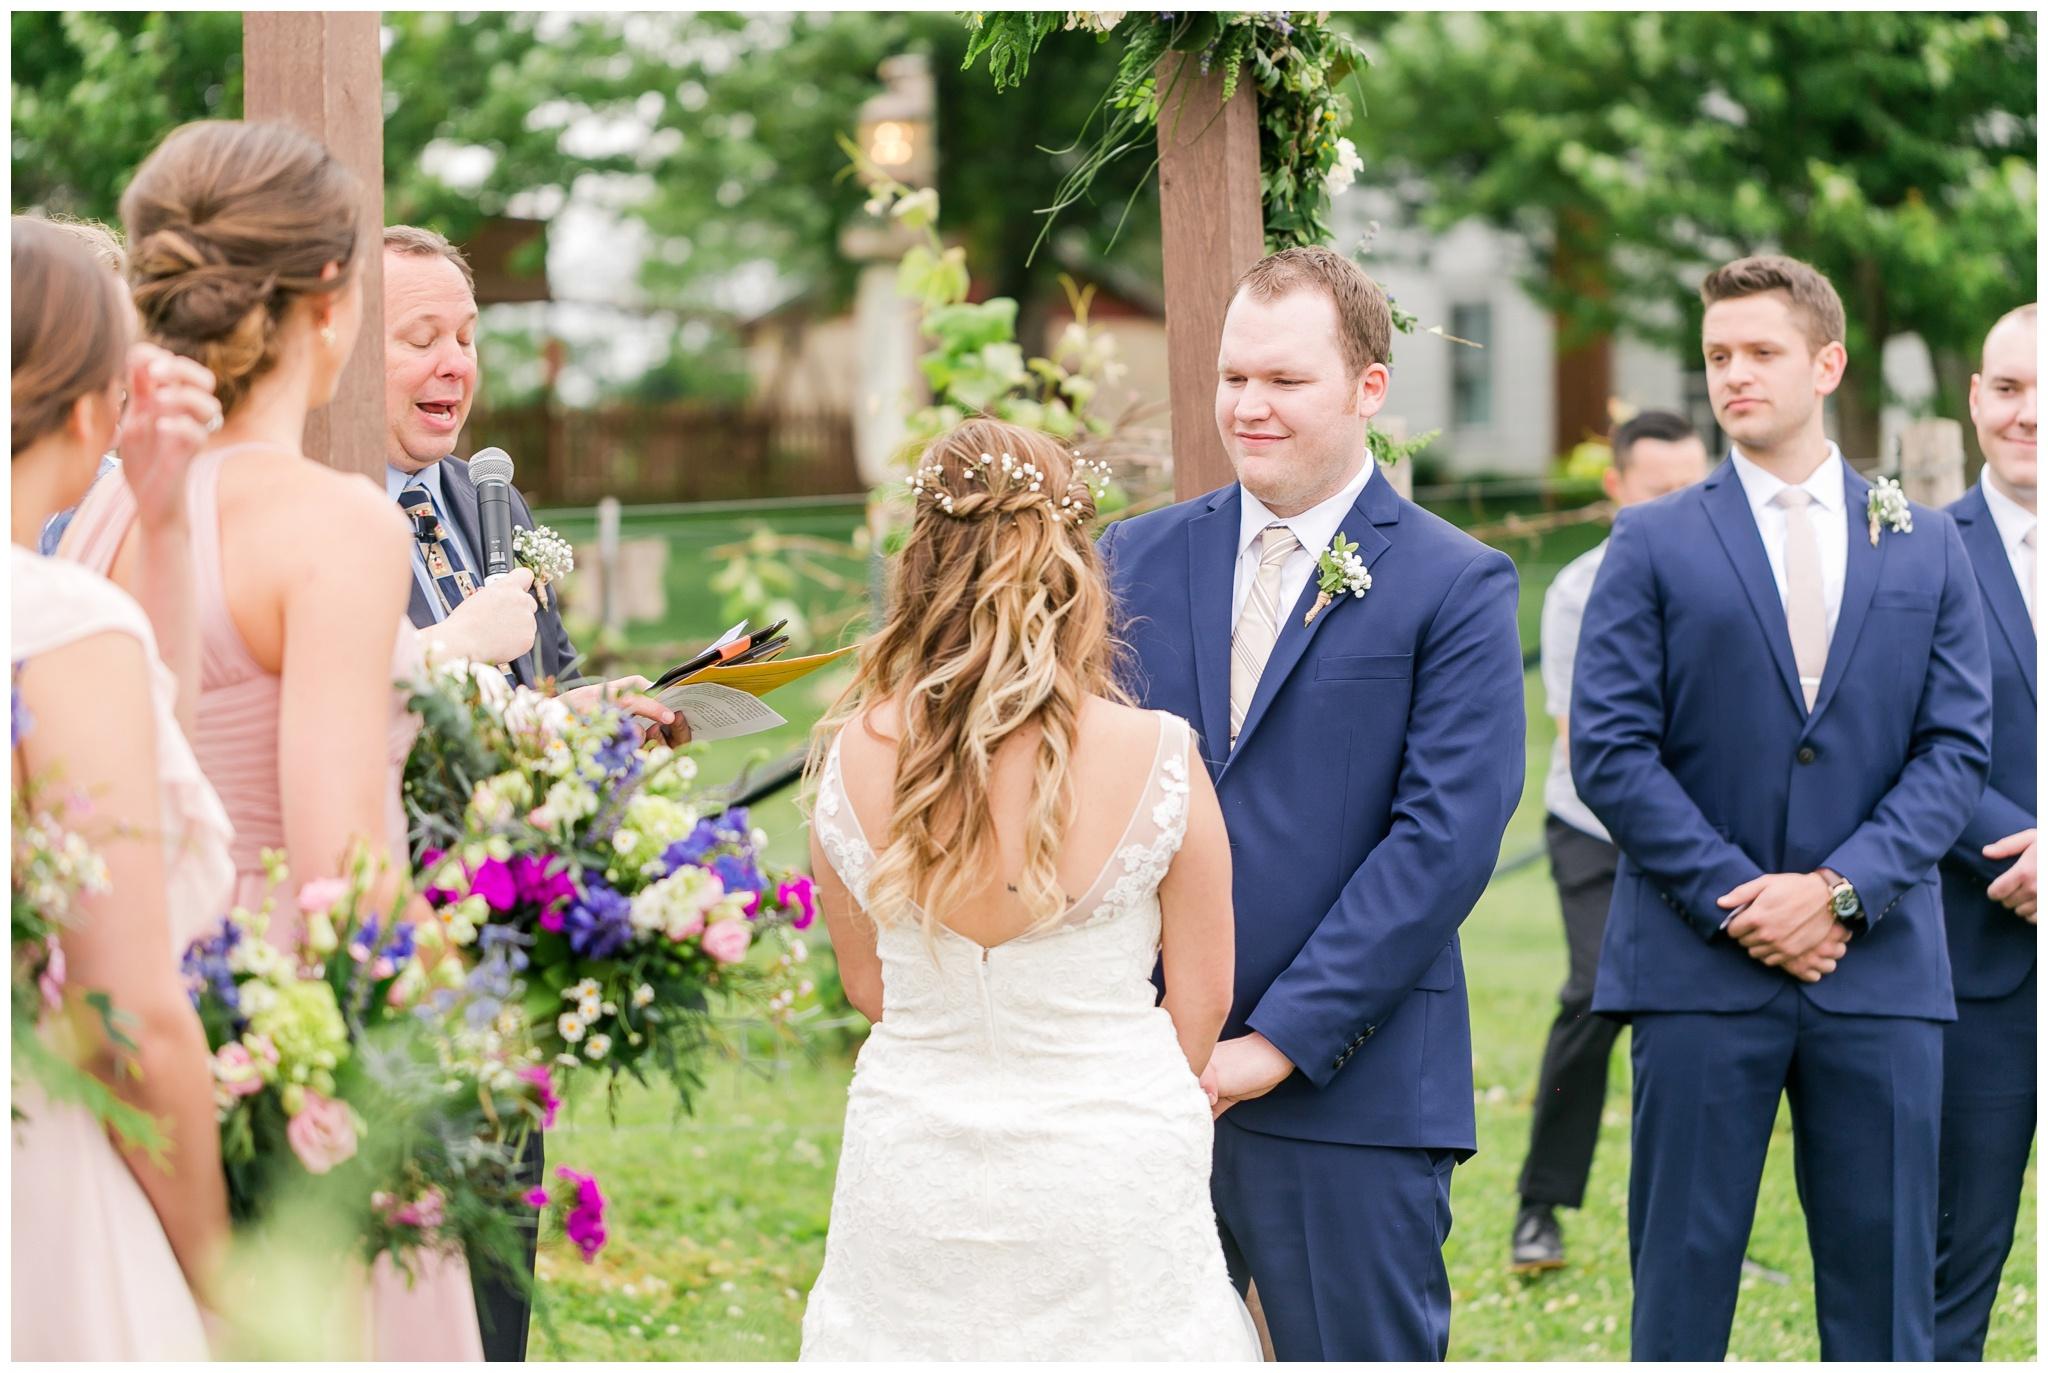 over_the_vines_wedding_edgerton_wisconsin_wedding_caynay_photo_4029.jpg